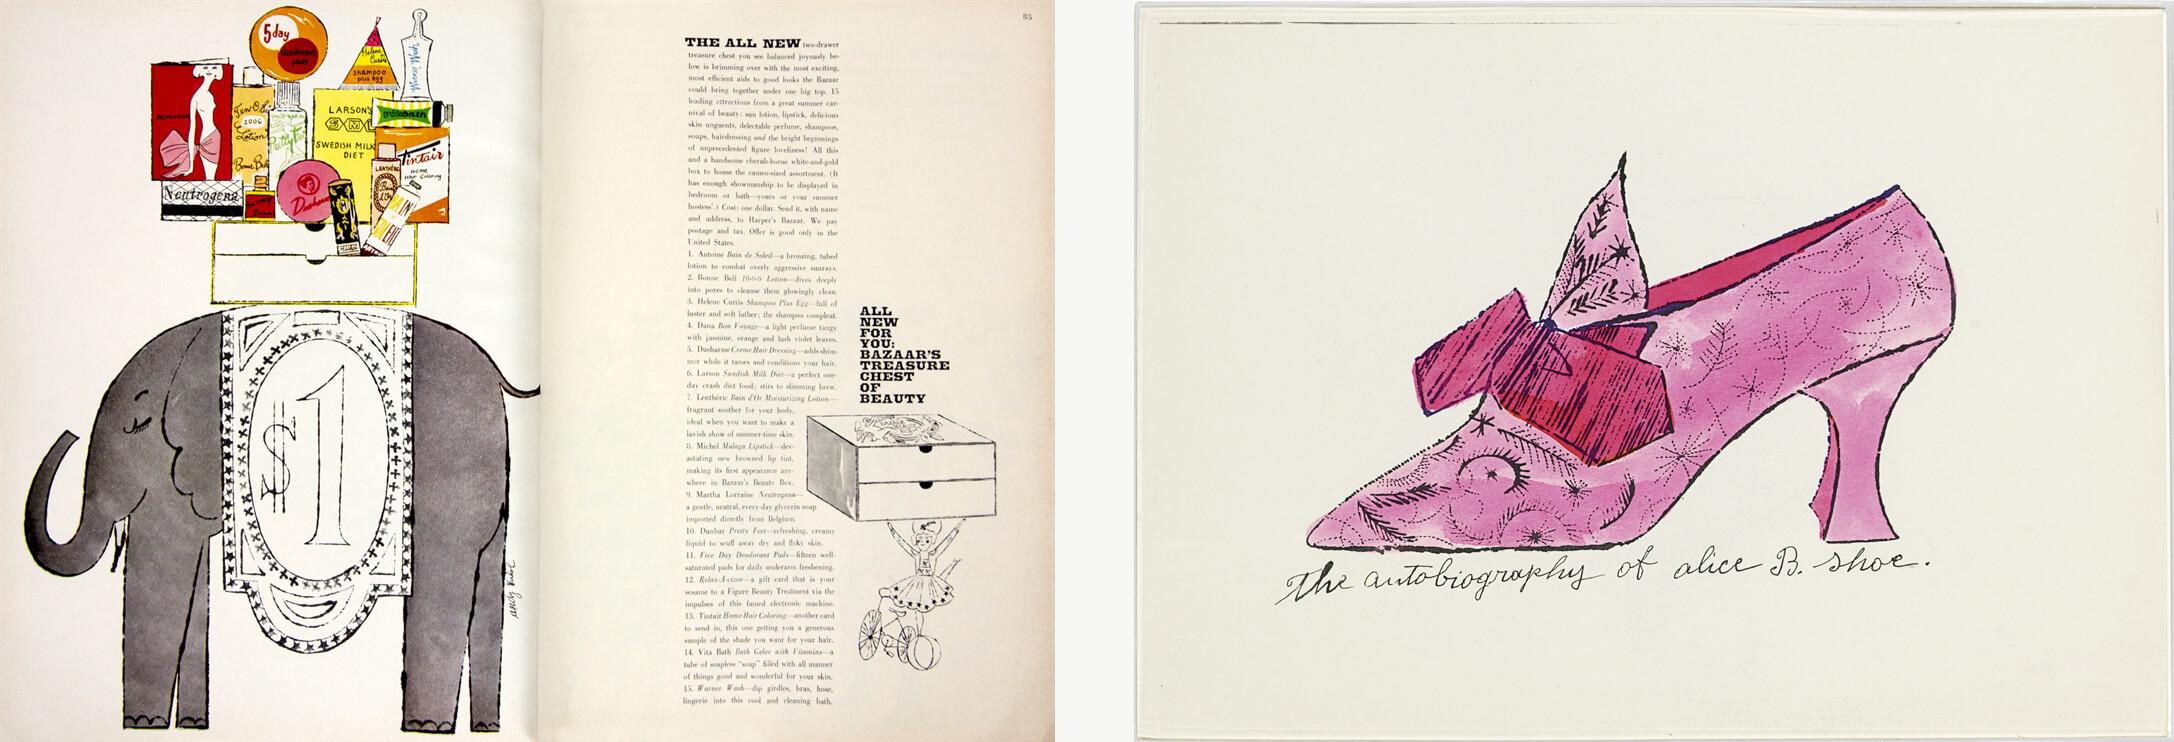 AndyWarhol-Illustrations-1950s.jpg